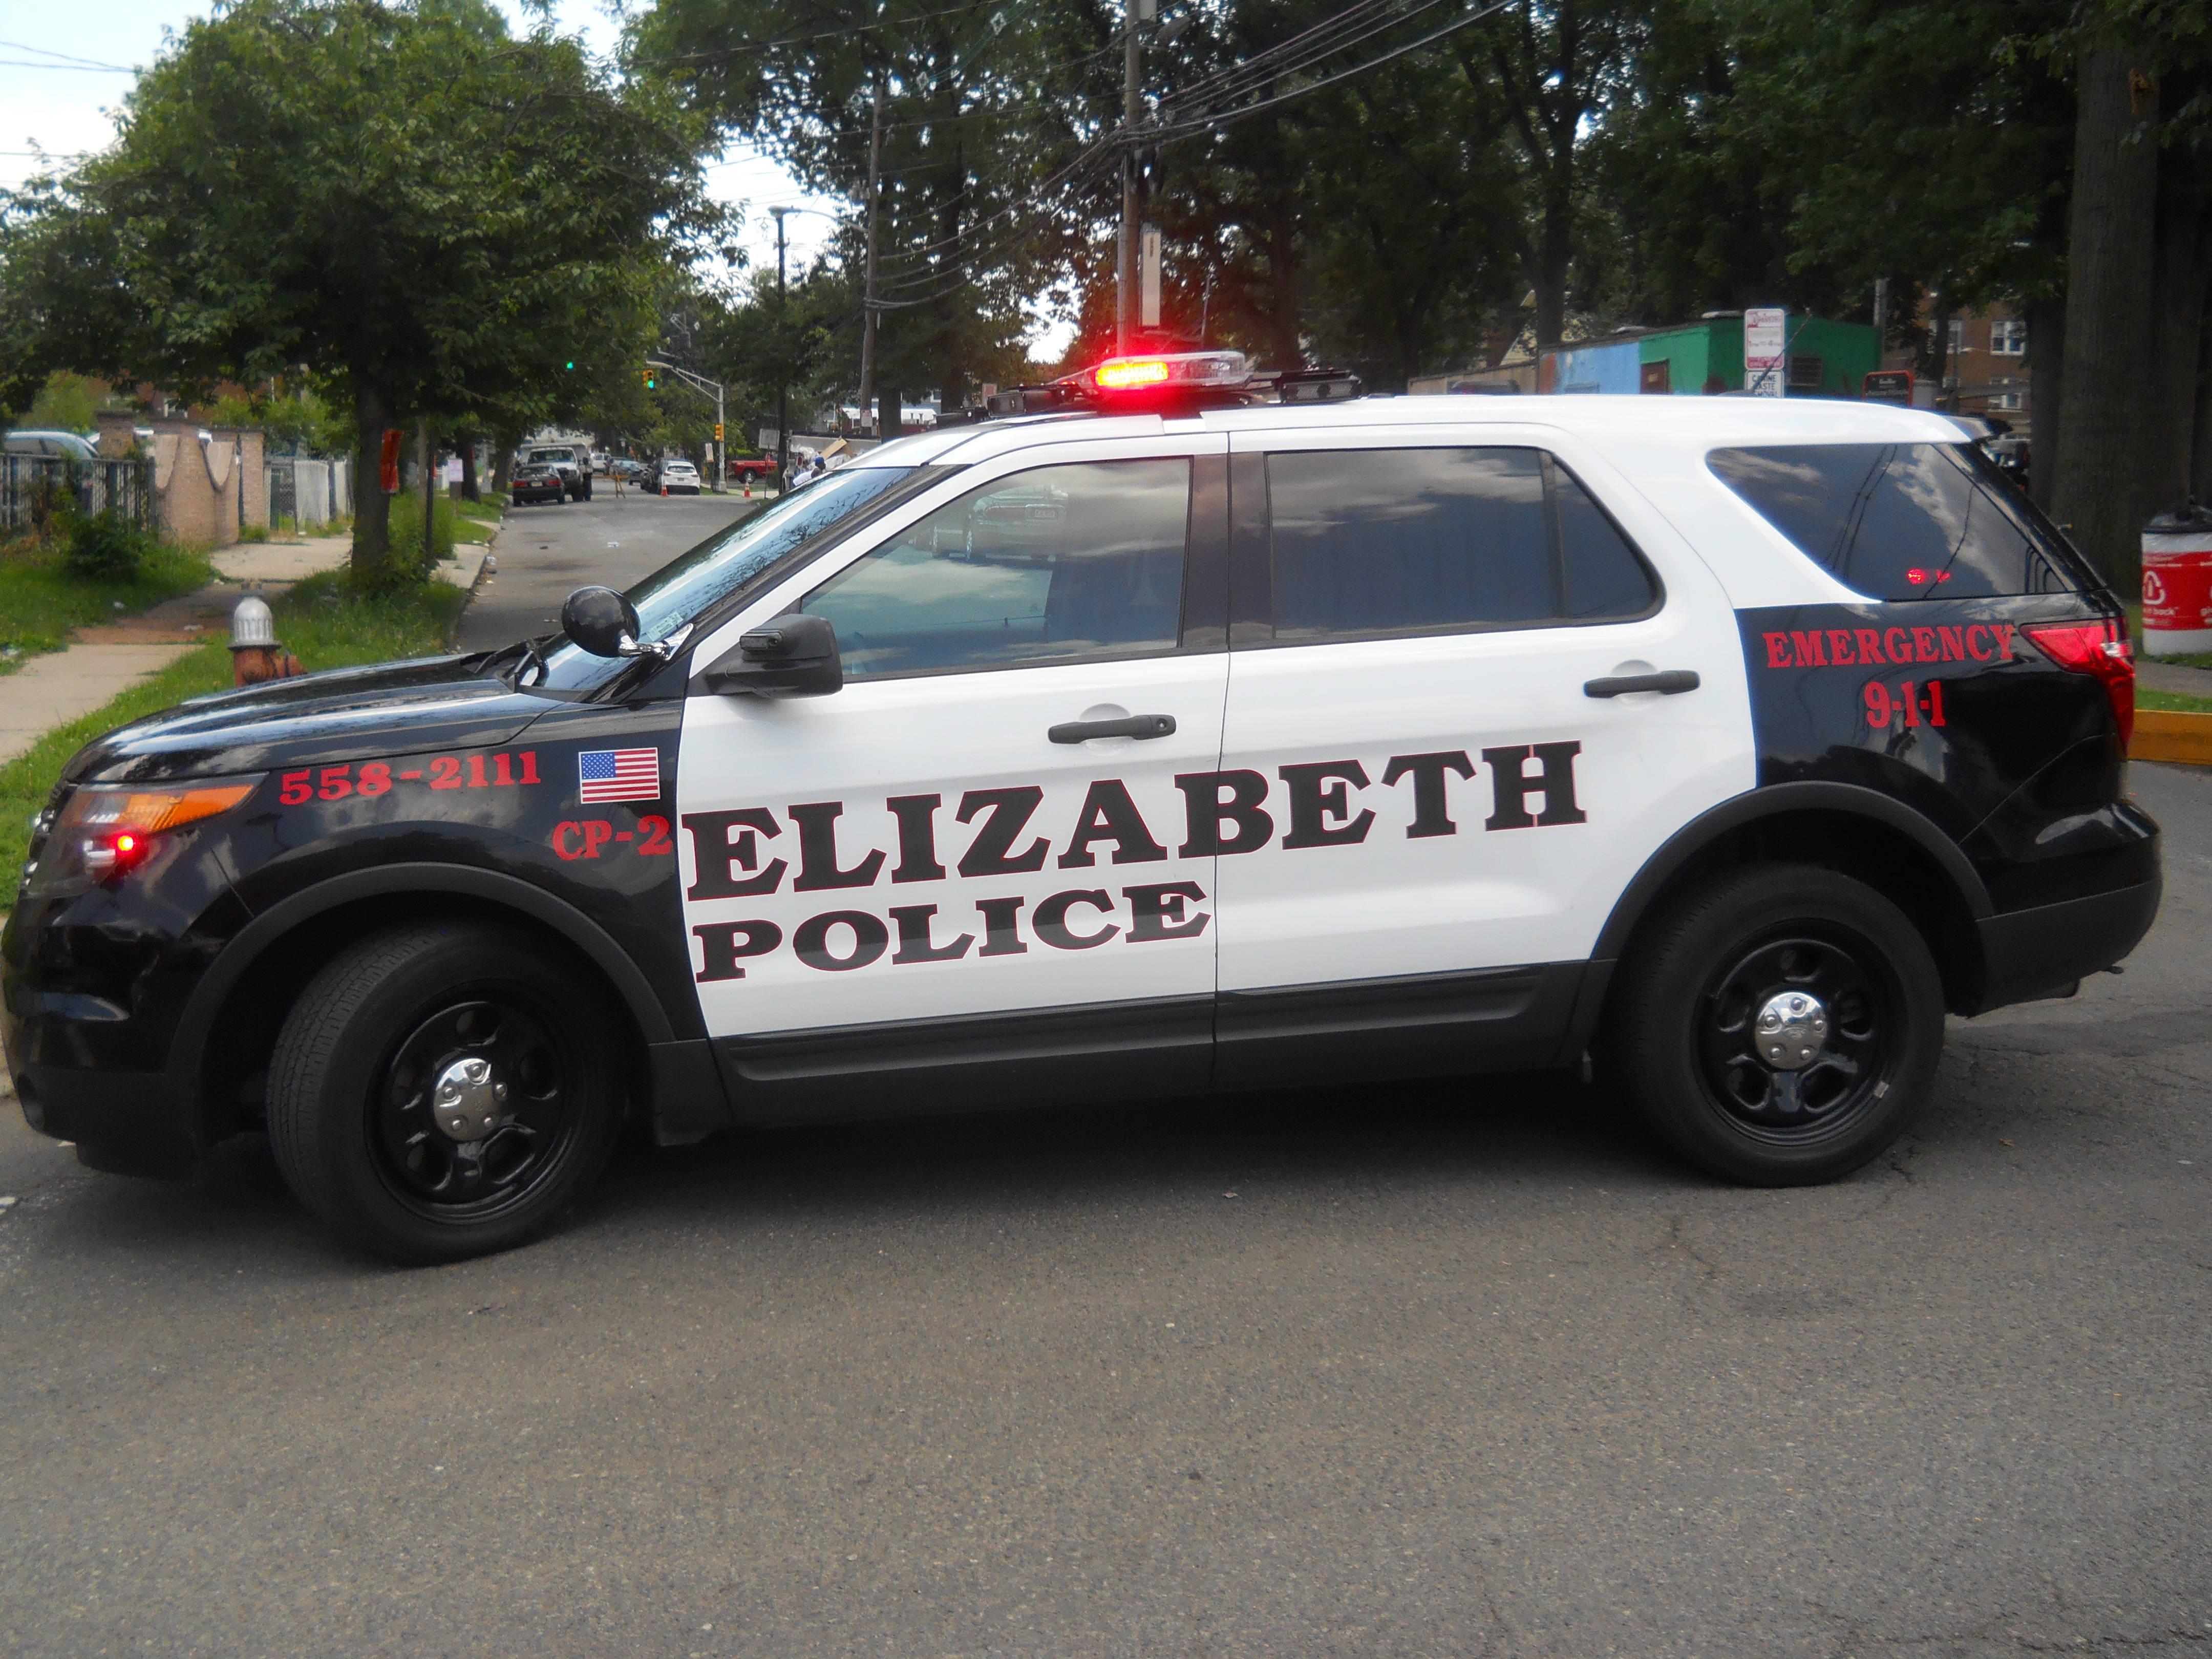 6f383b3f77f153a8b0d1_Police_Car.jpg